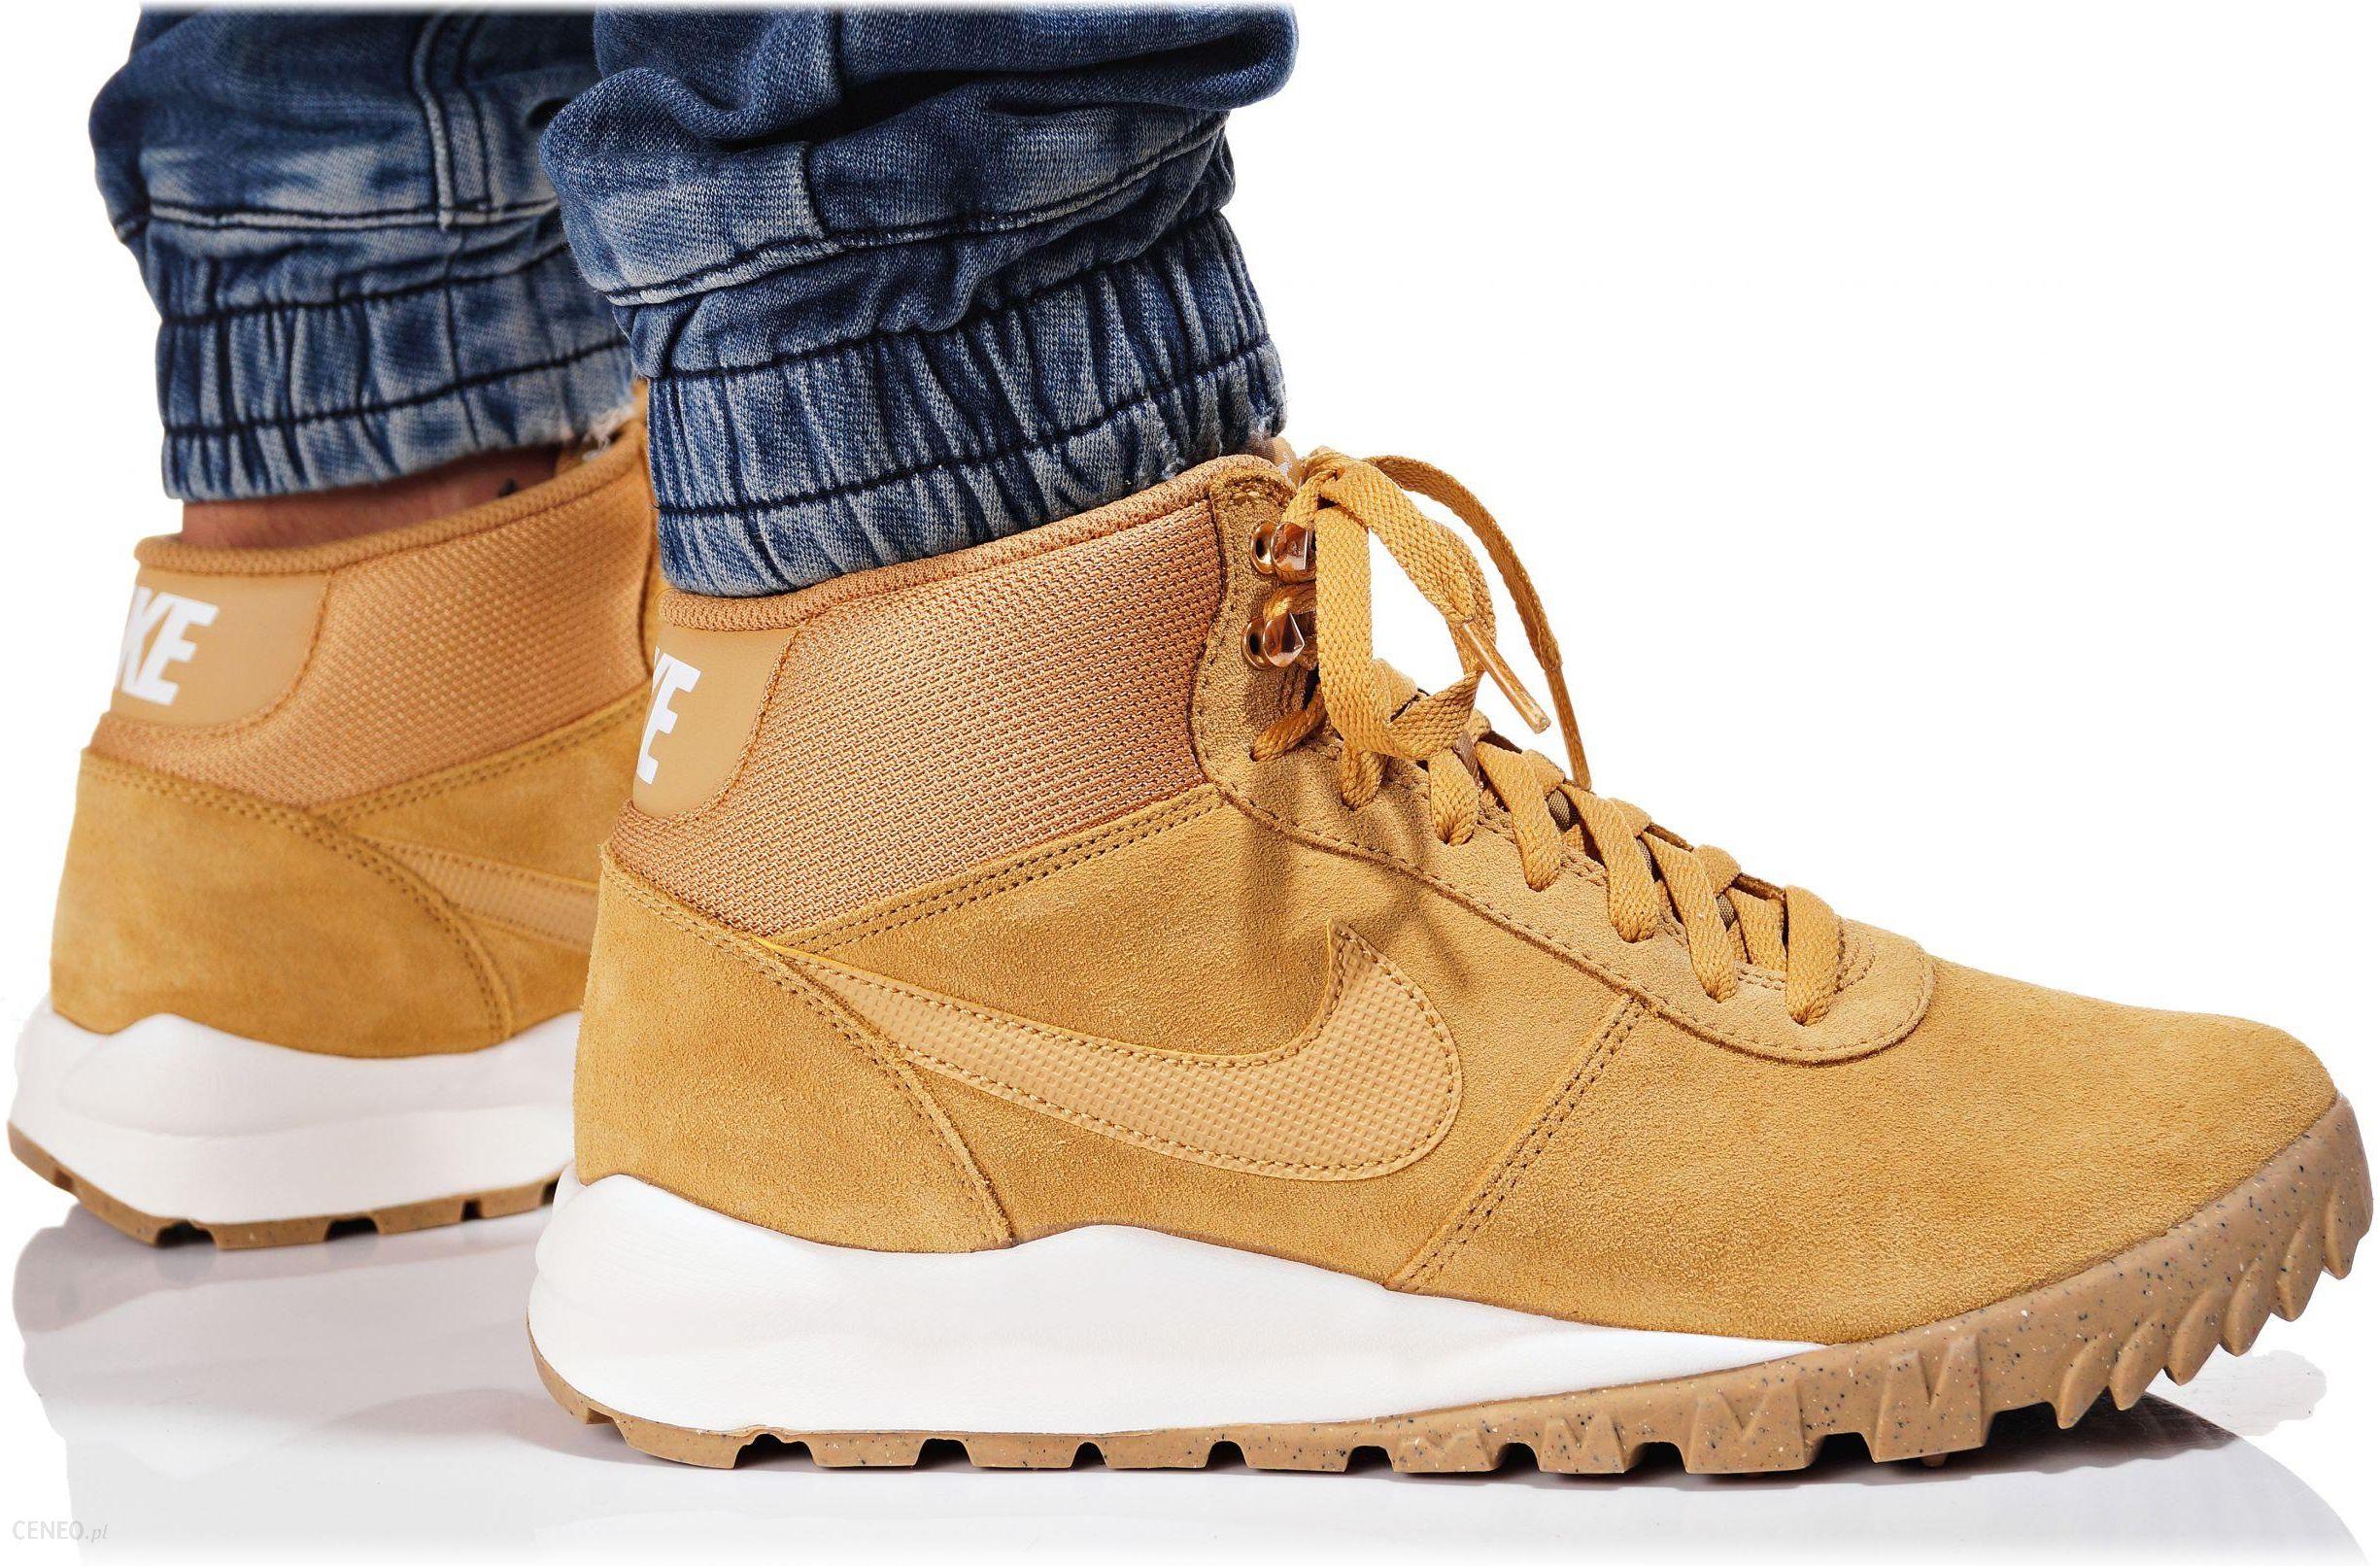 Buty Nike Hoodland Suede 654888 727 Męskie Zimowe